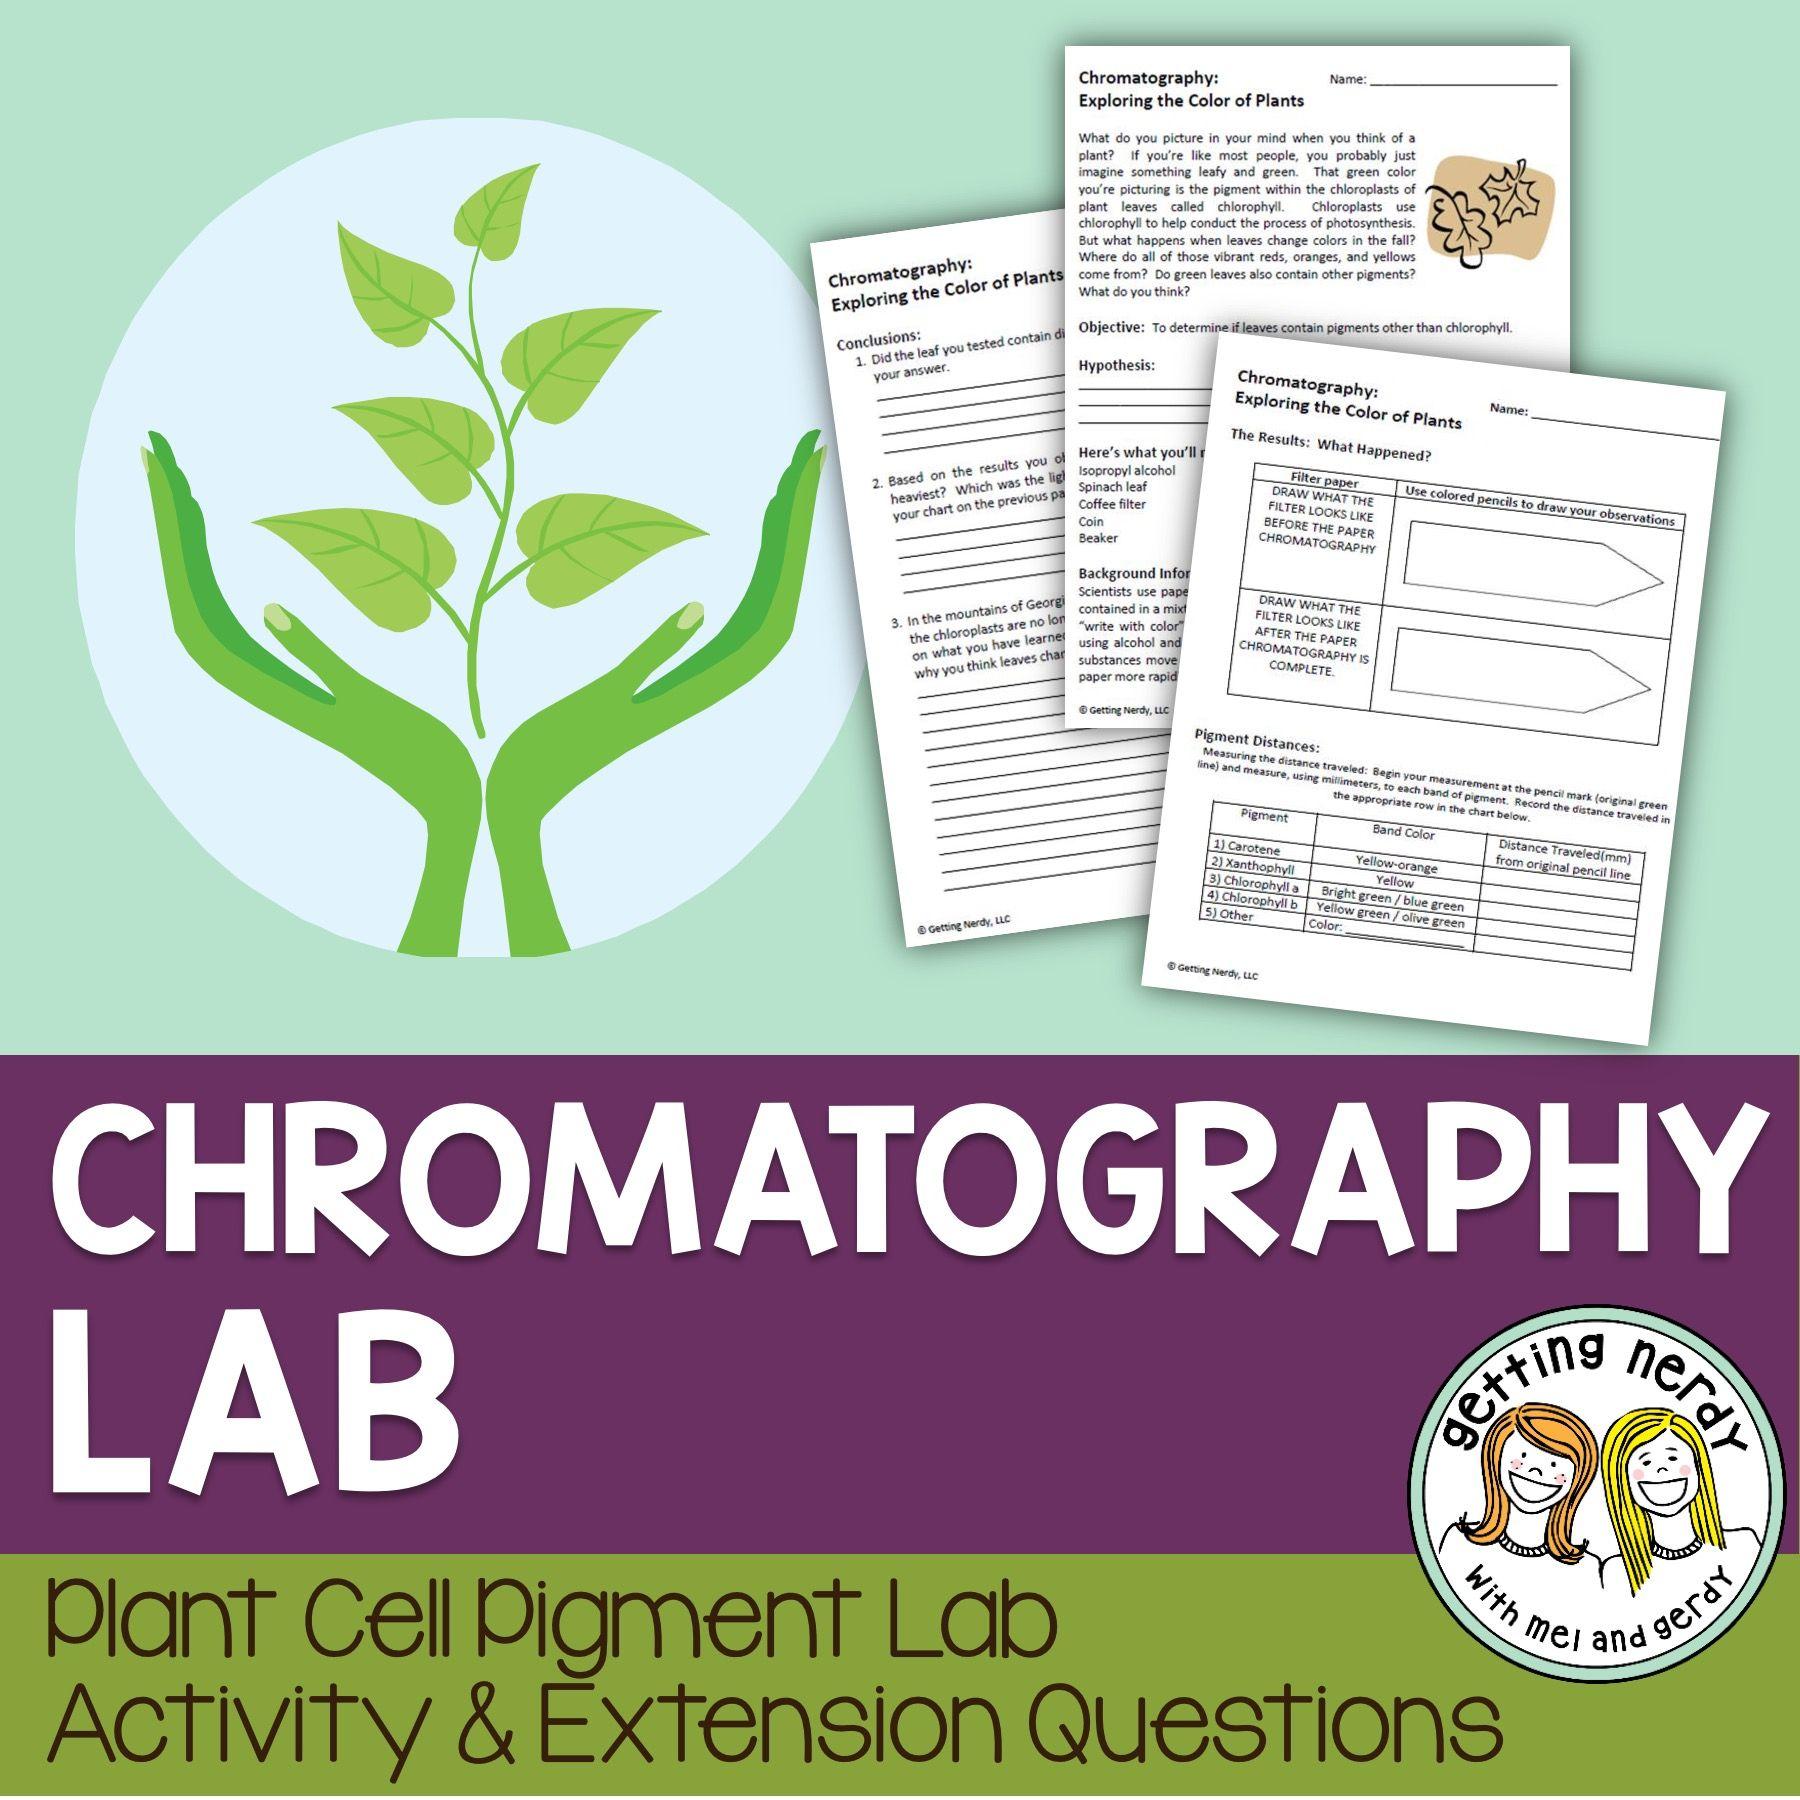 Plant Cell Pigment Chromatography Lab